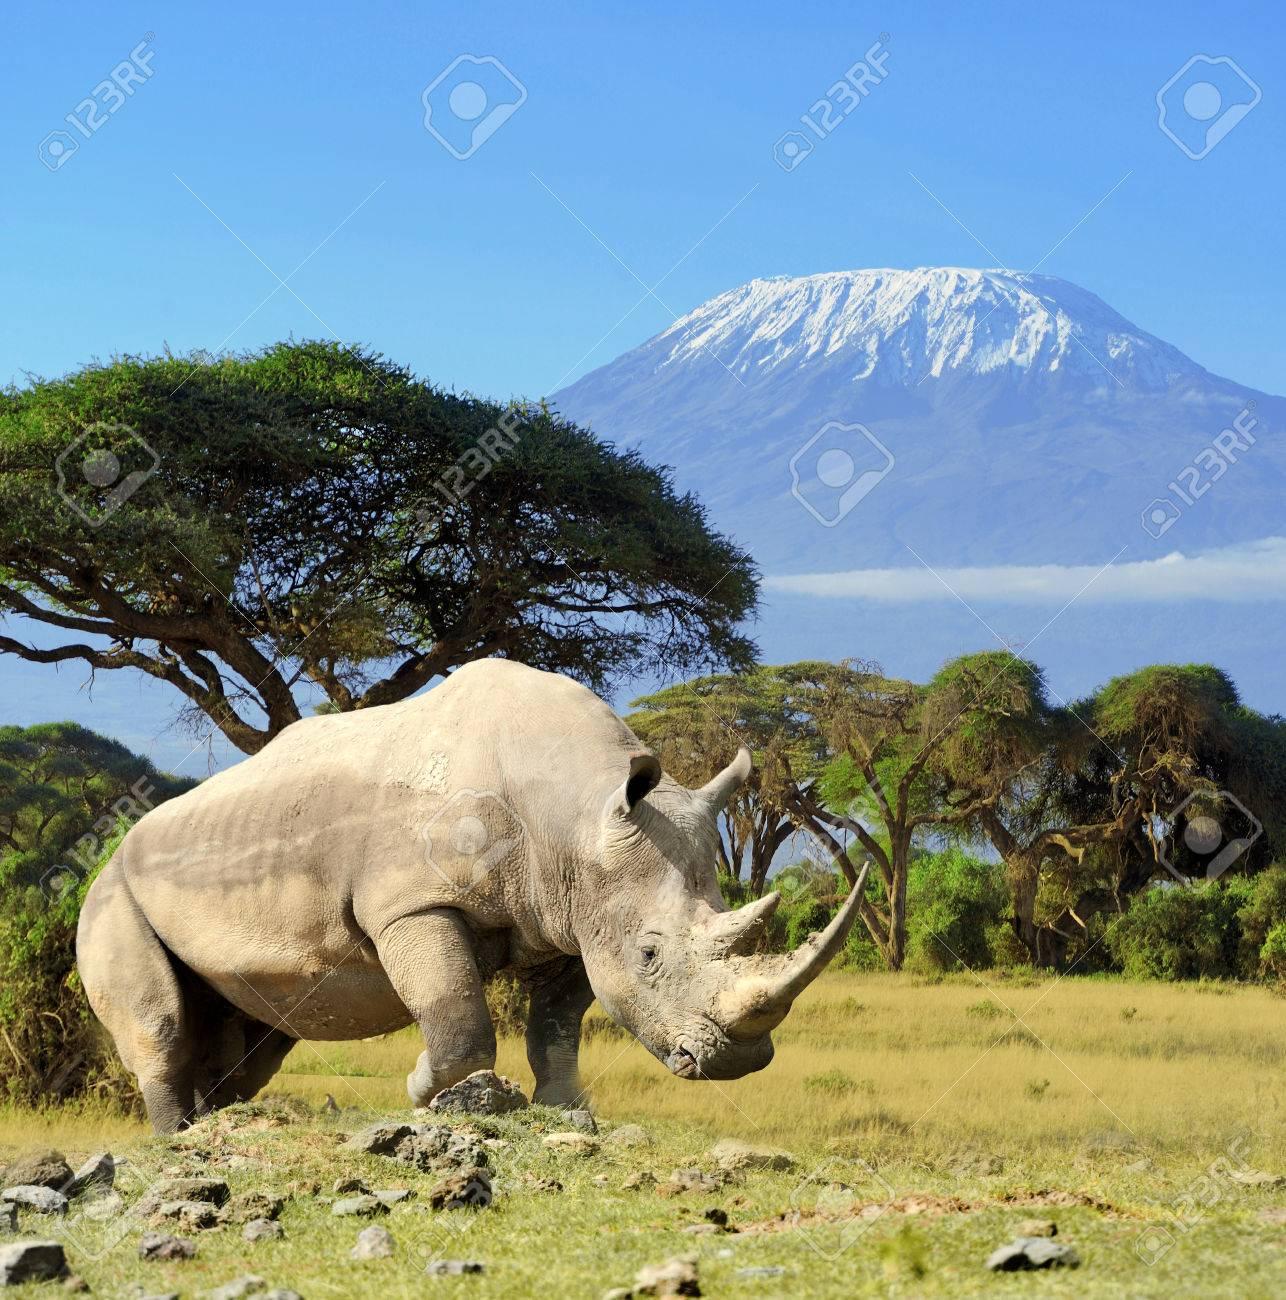 Rhino in front of Kilimanjaro mountain - Amboseli national park Kenya Standard-Bild - 37378464